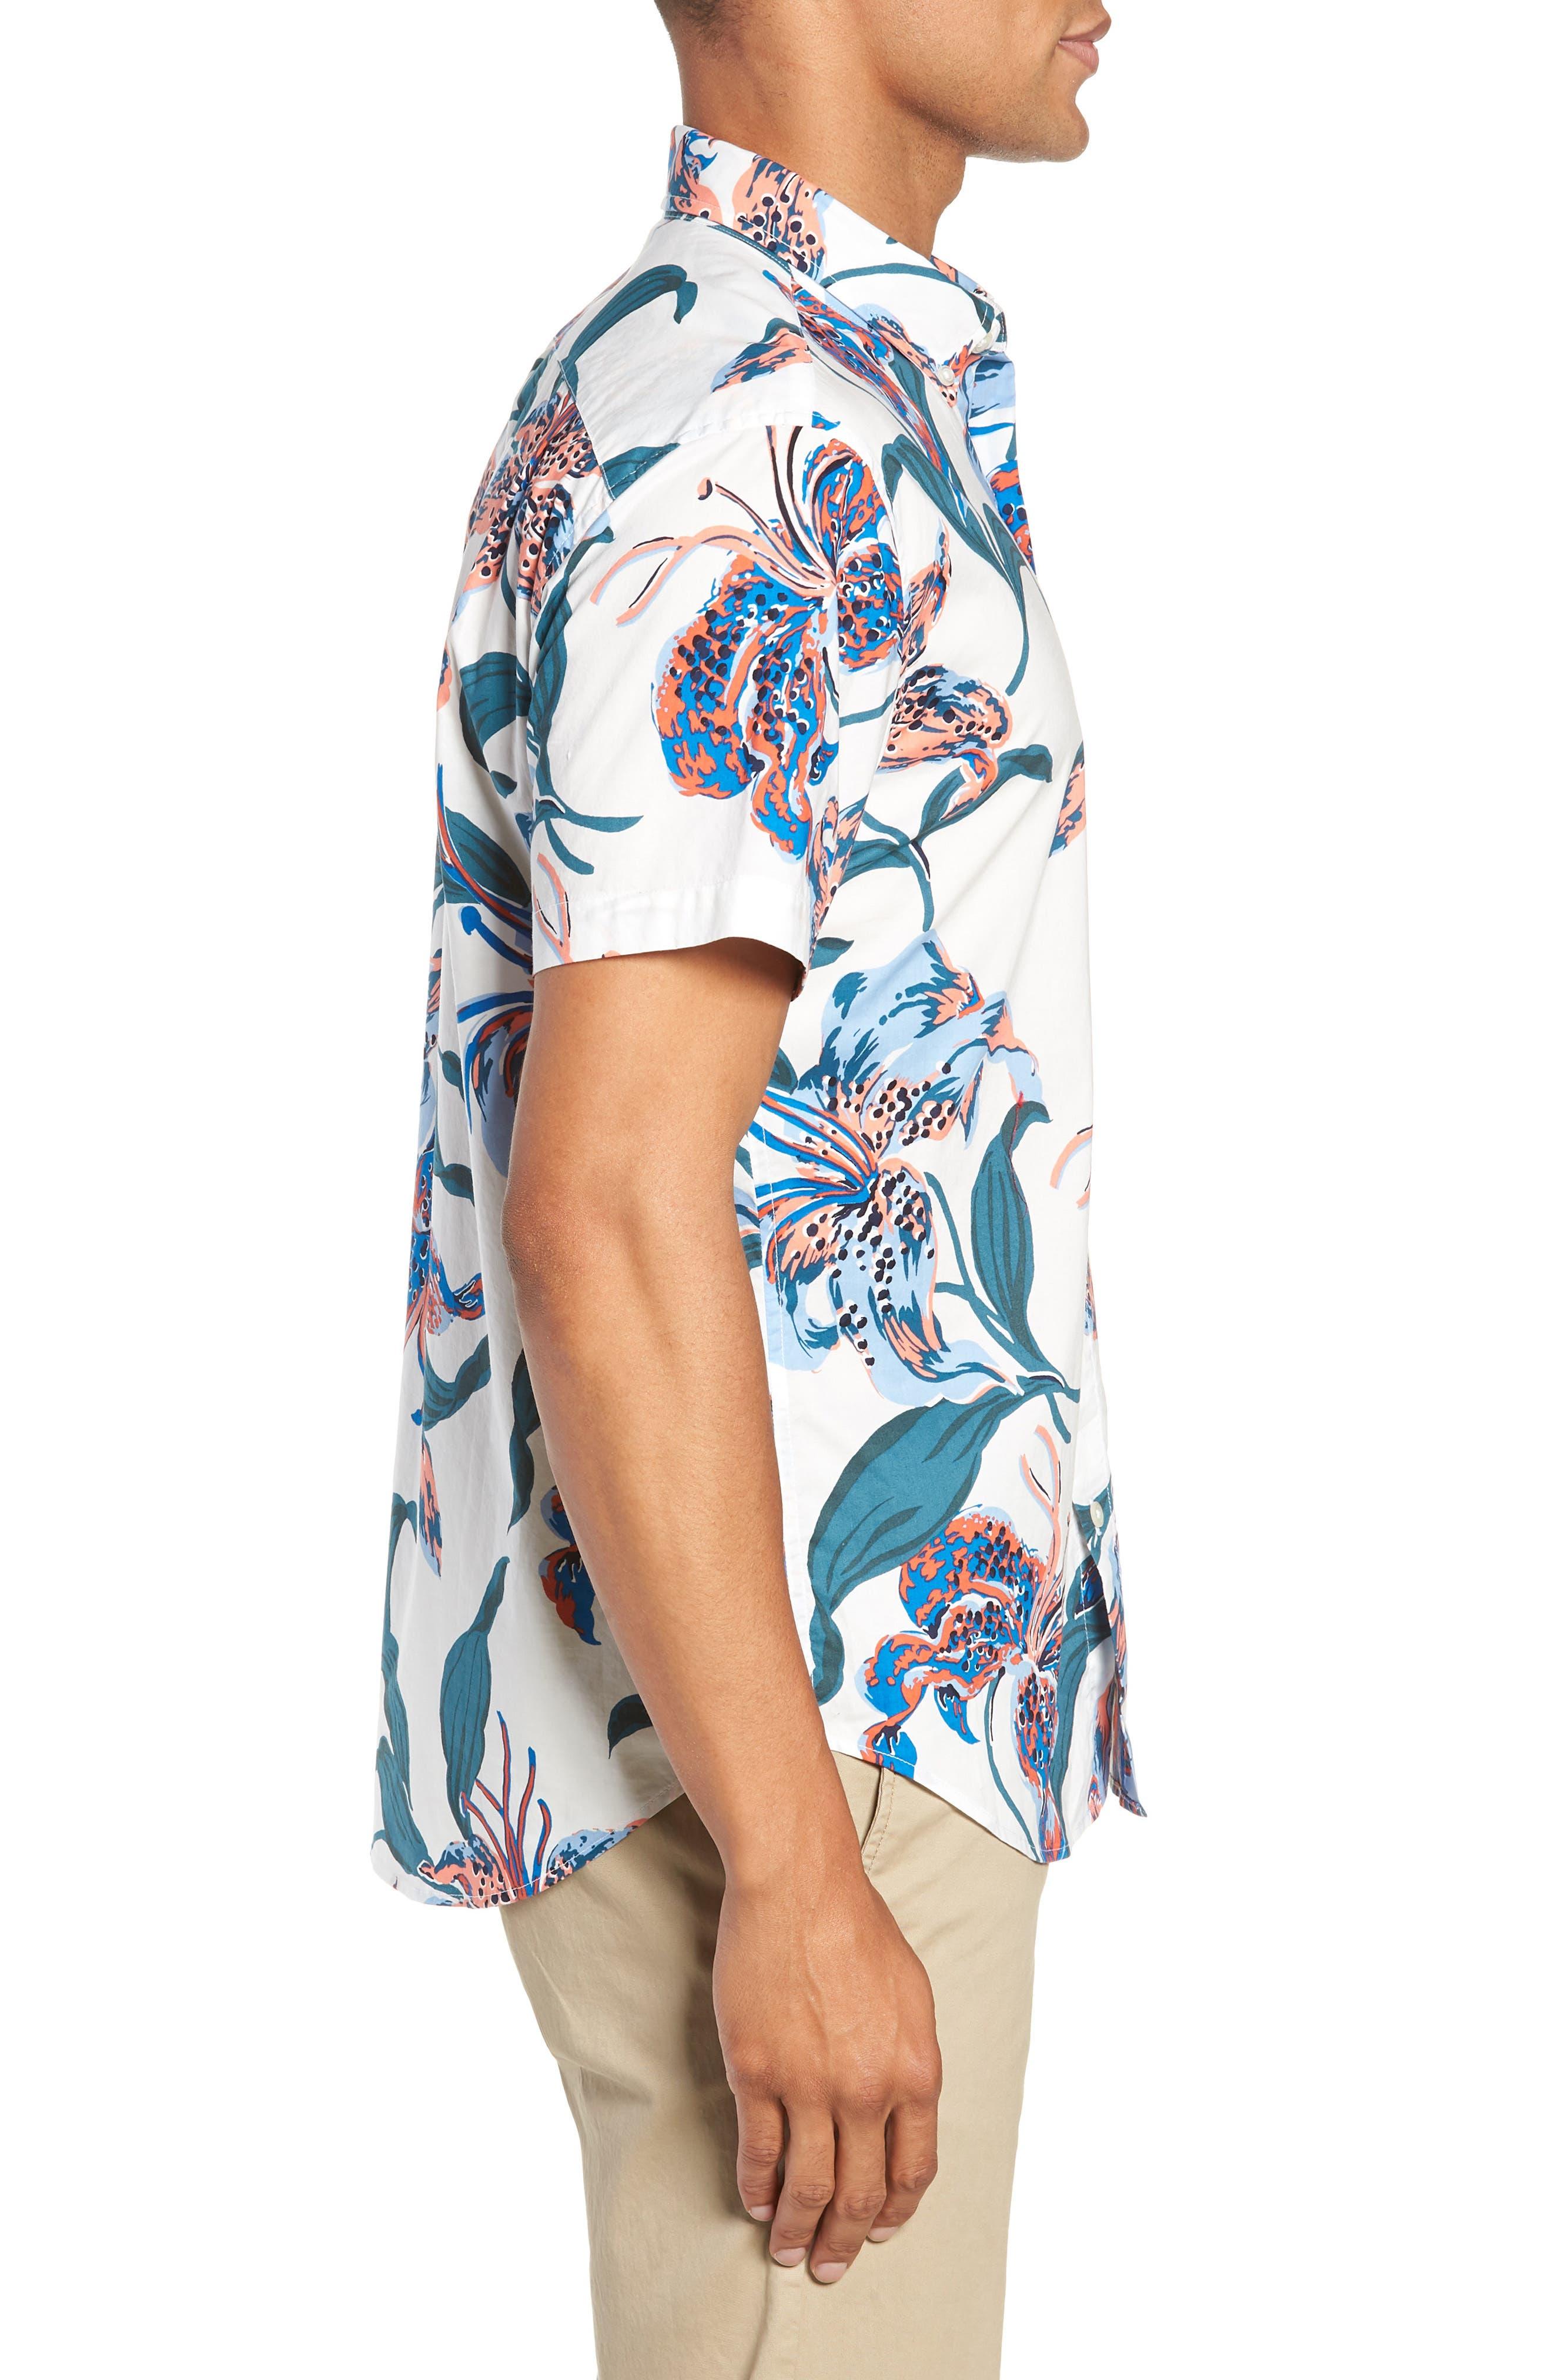 Riviera Slim Fit Floral Sport Shirt,                             Alternate thumbnail 4, color,                             BRIGHTON FLORAL - BLUE LEGACY